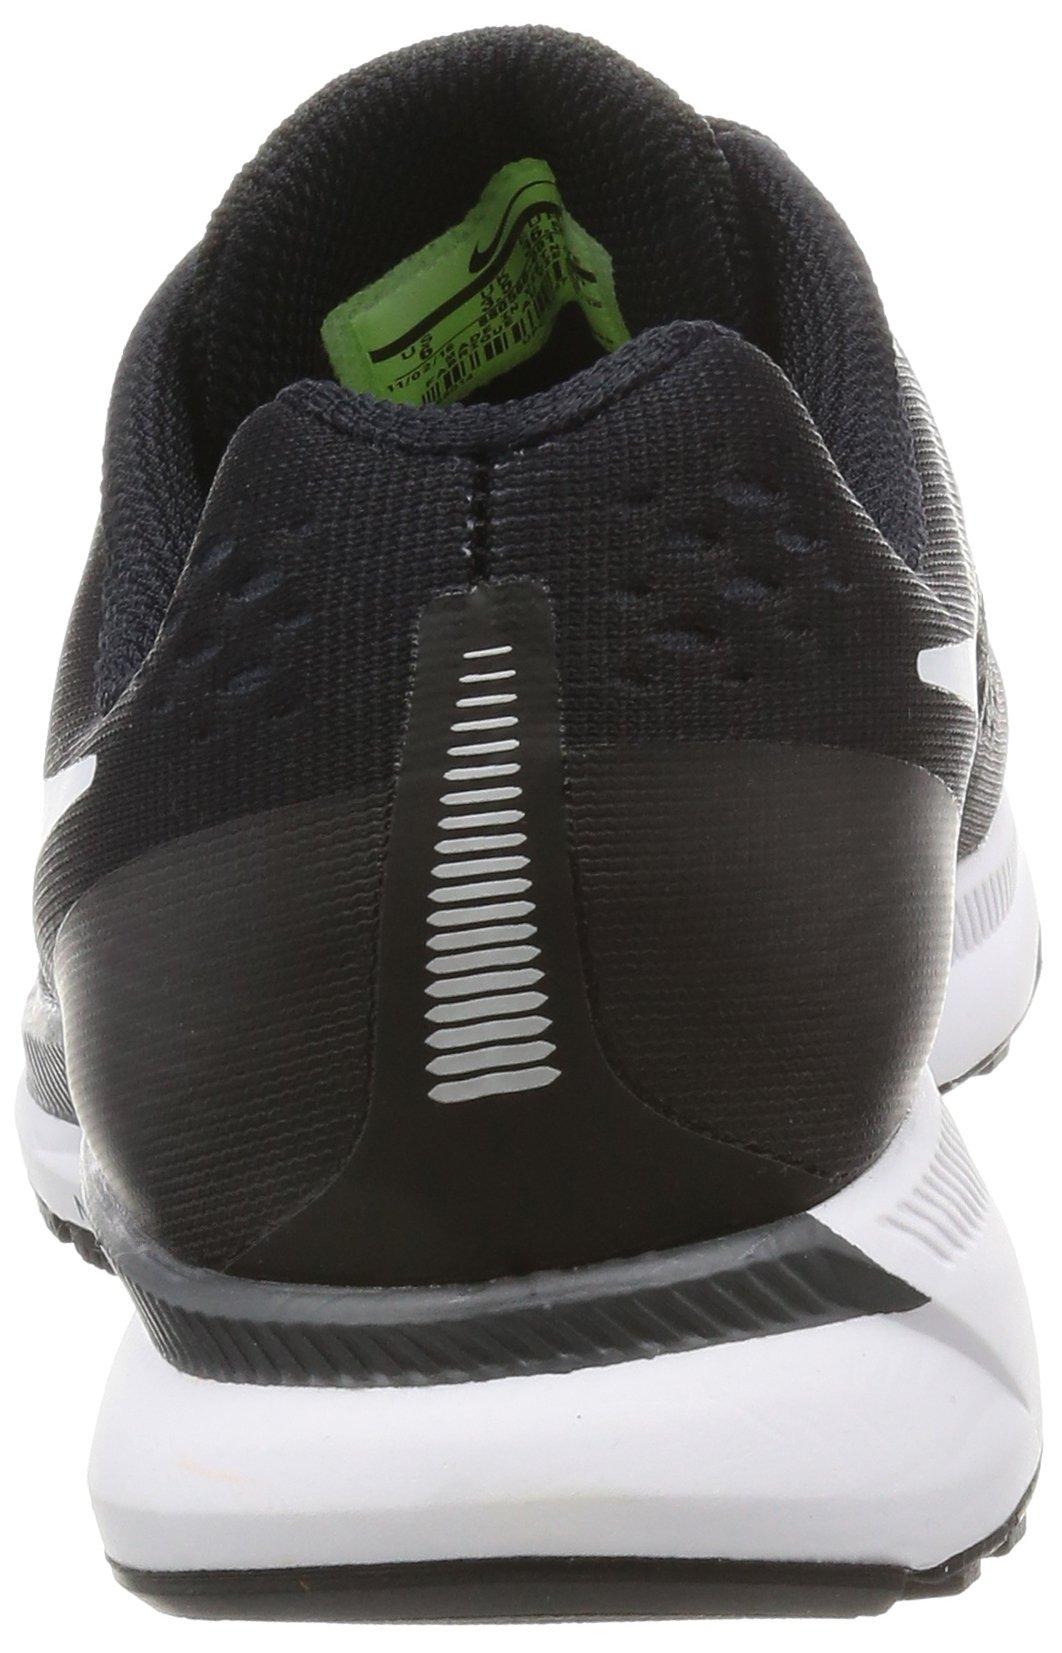 Nike Womens Air Zoom Pegasus 34 Black/White/Dark Grey/Anthracite Running Shoes (6) by Nike (Image #2)